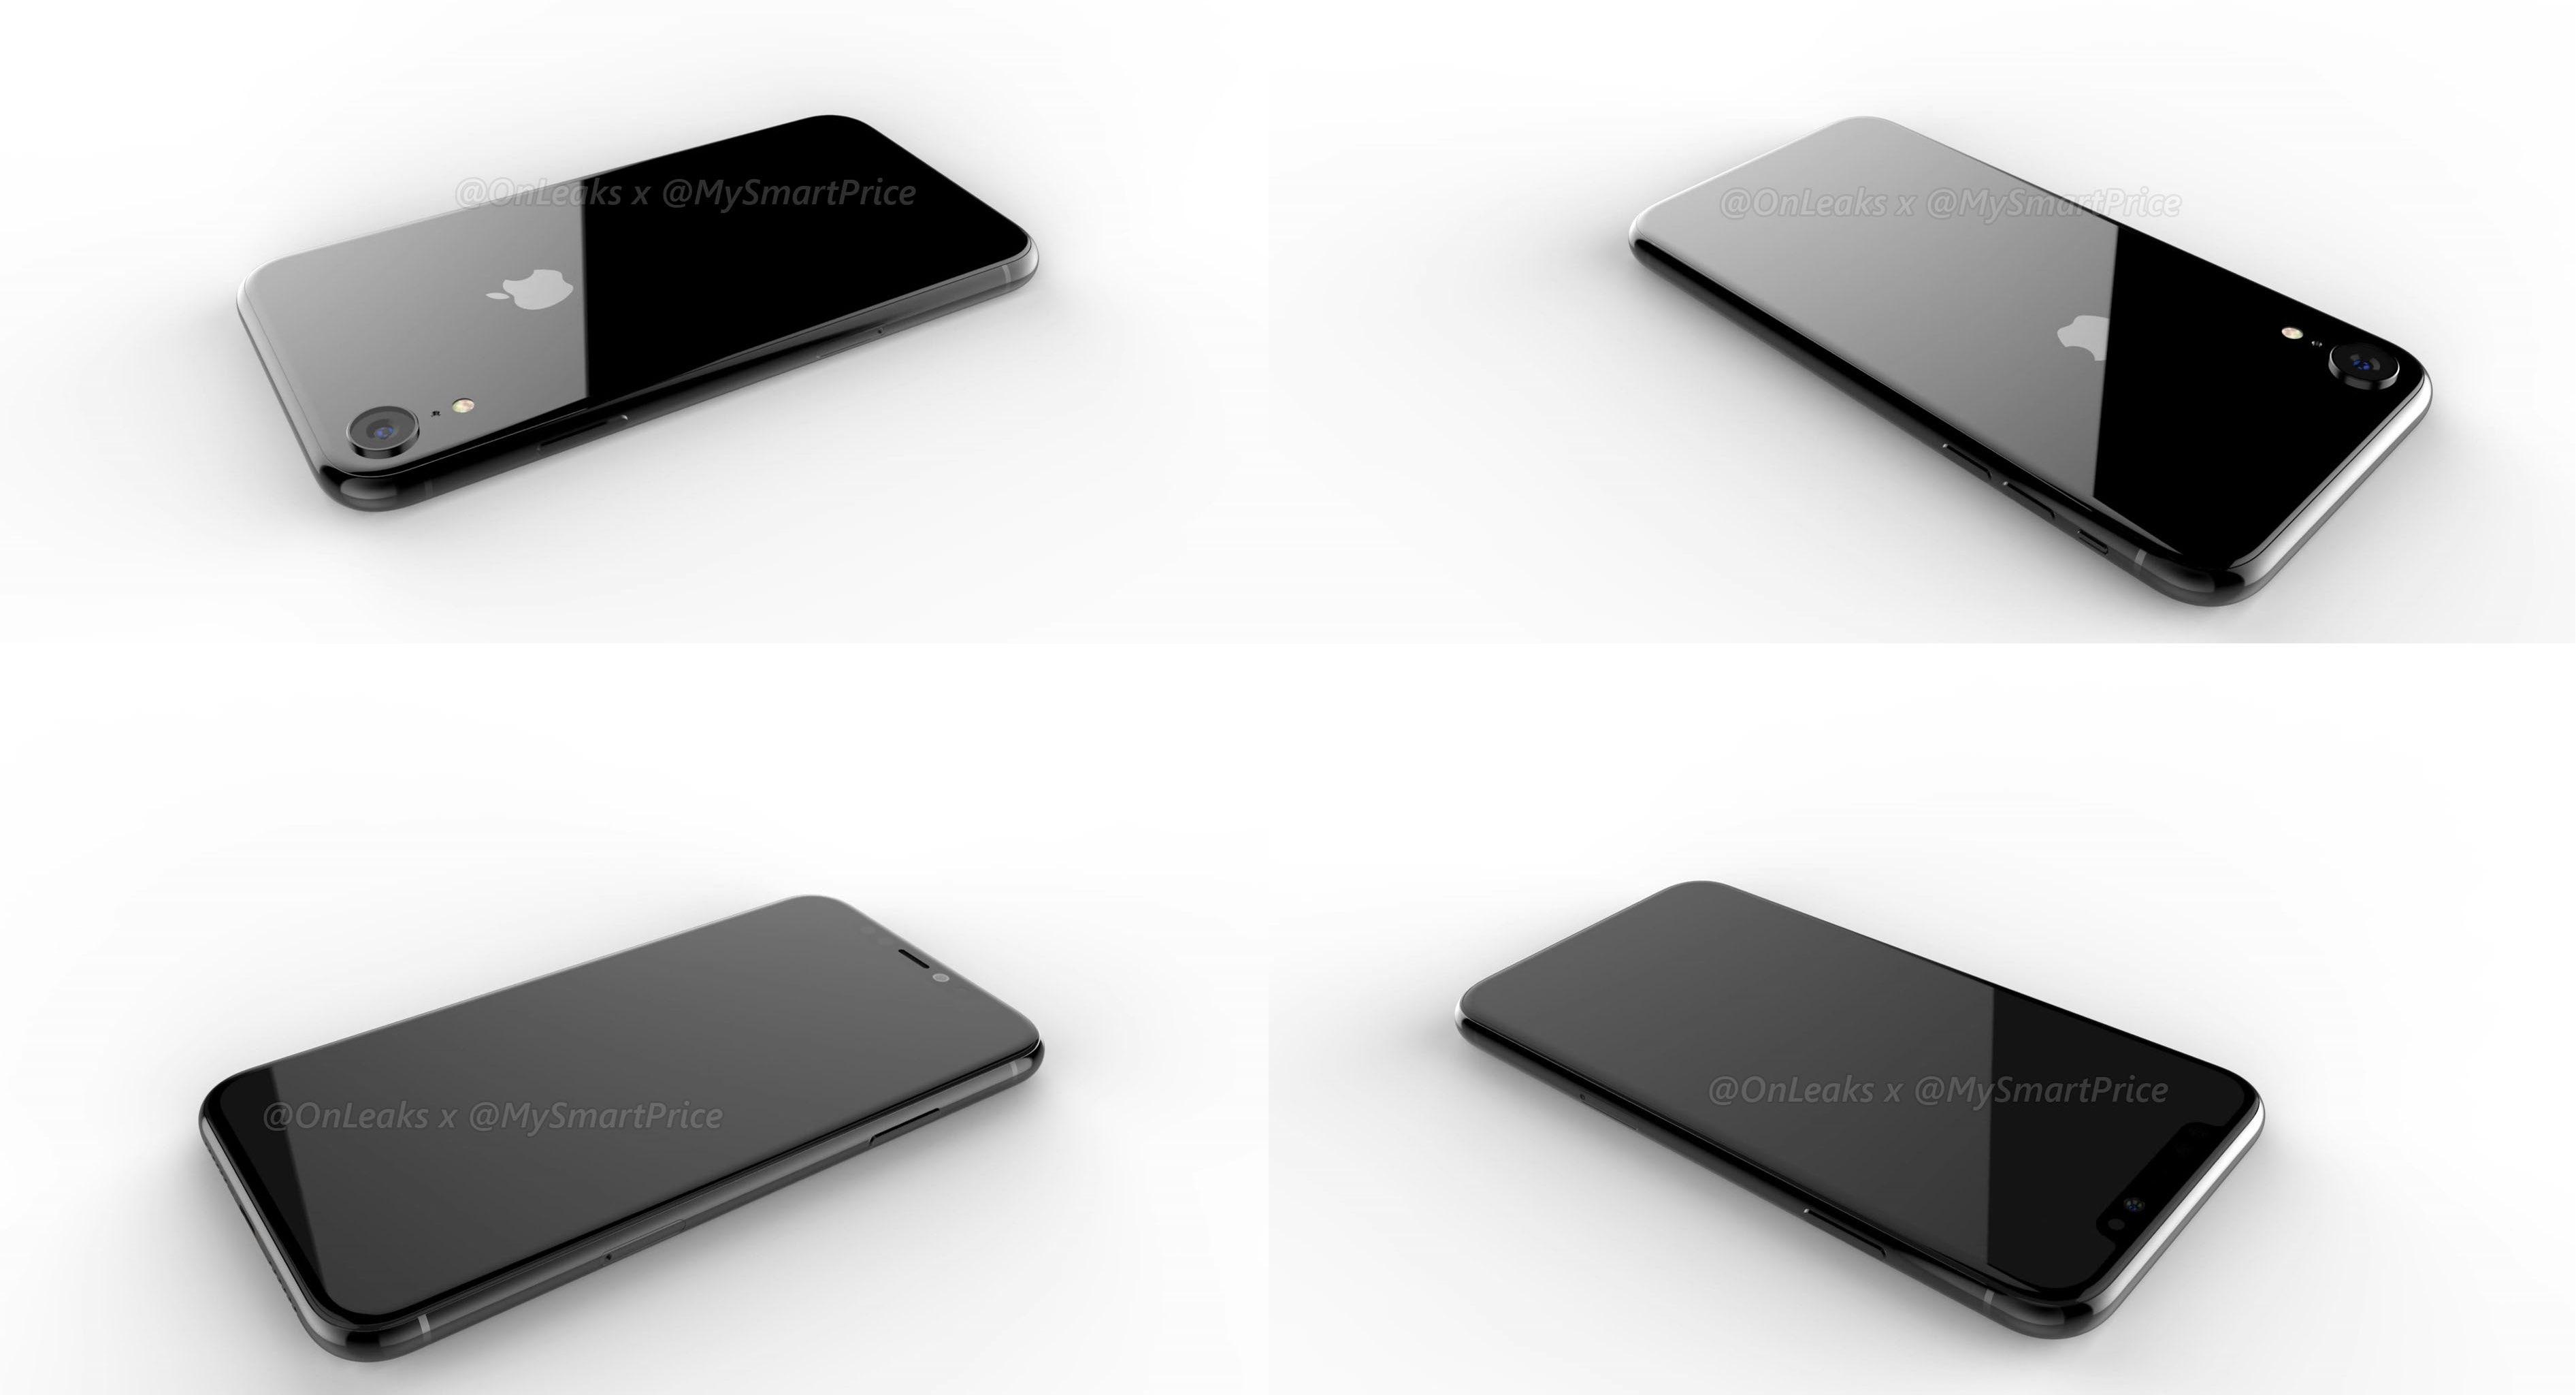 Budget iPhone X mockup